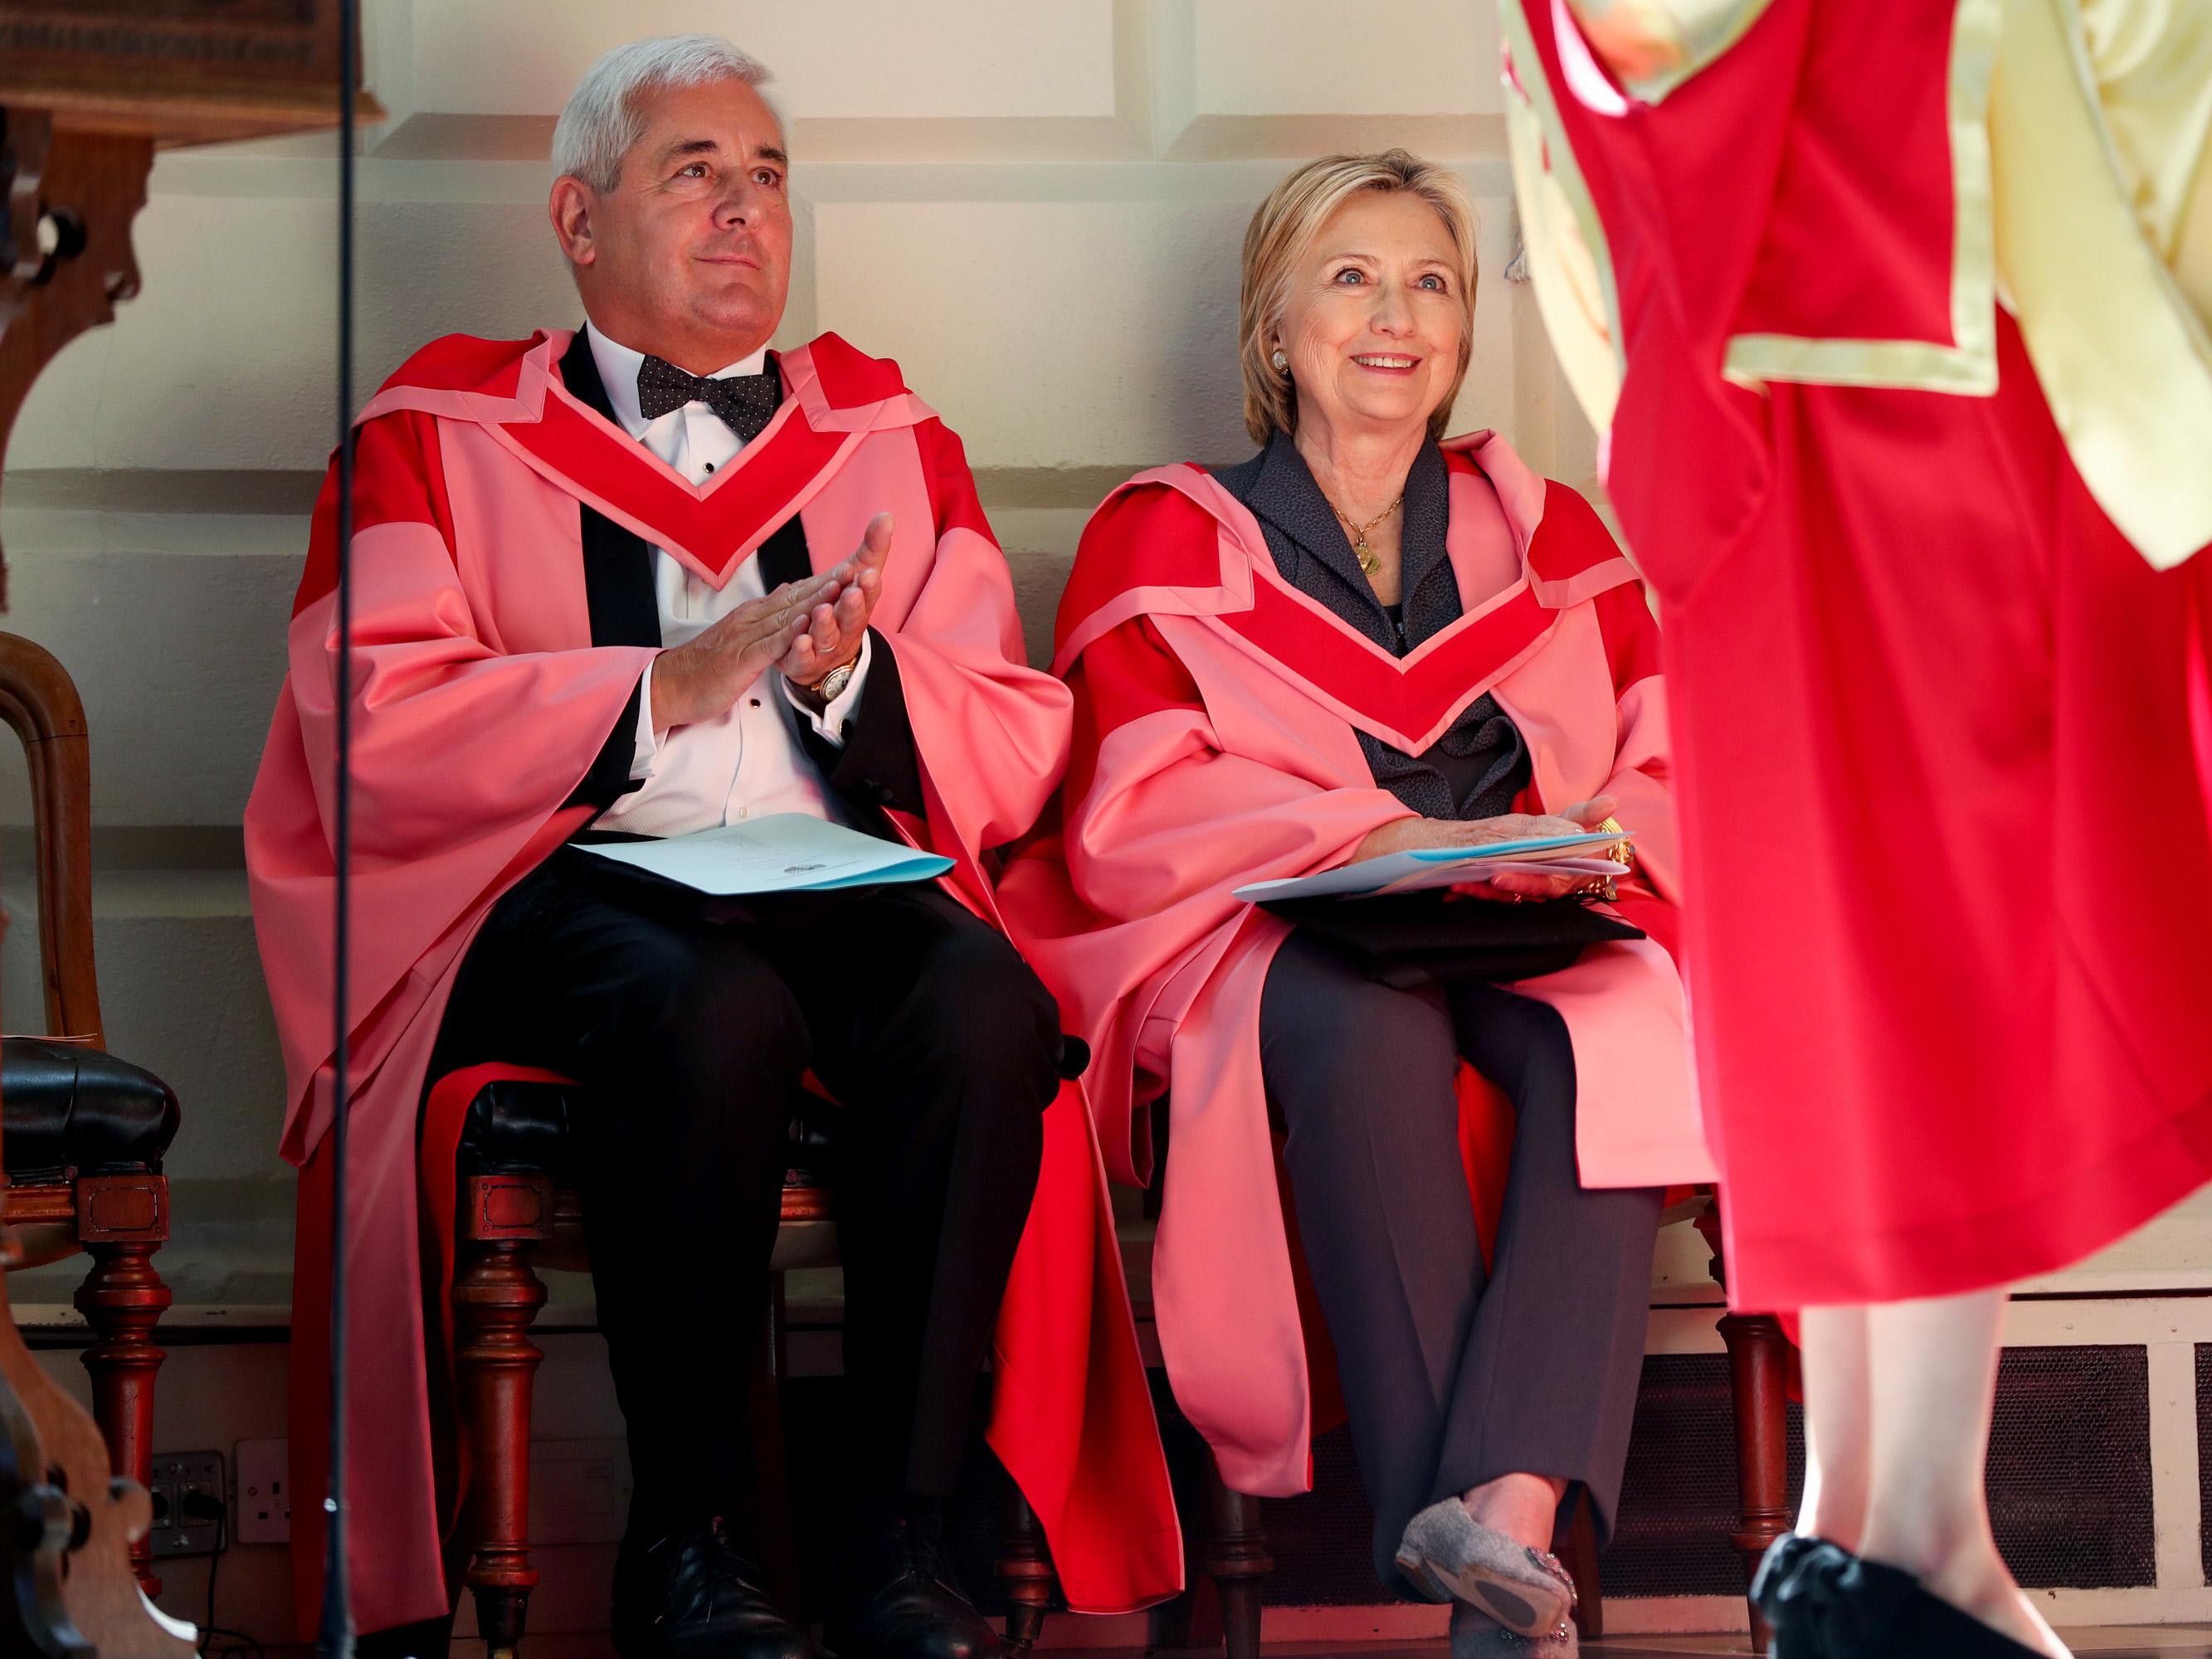 Paul Drechsler CBE alongside former US Presidential candidate Hillary Clinton.